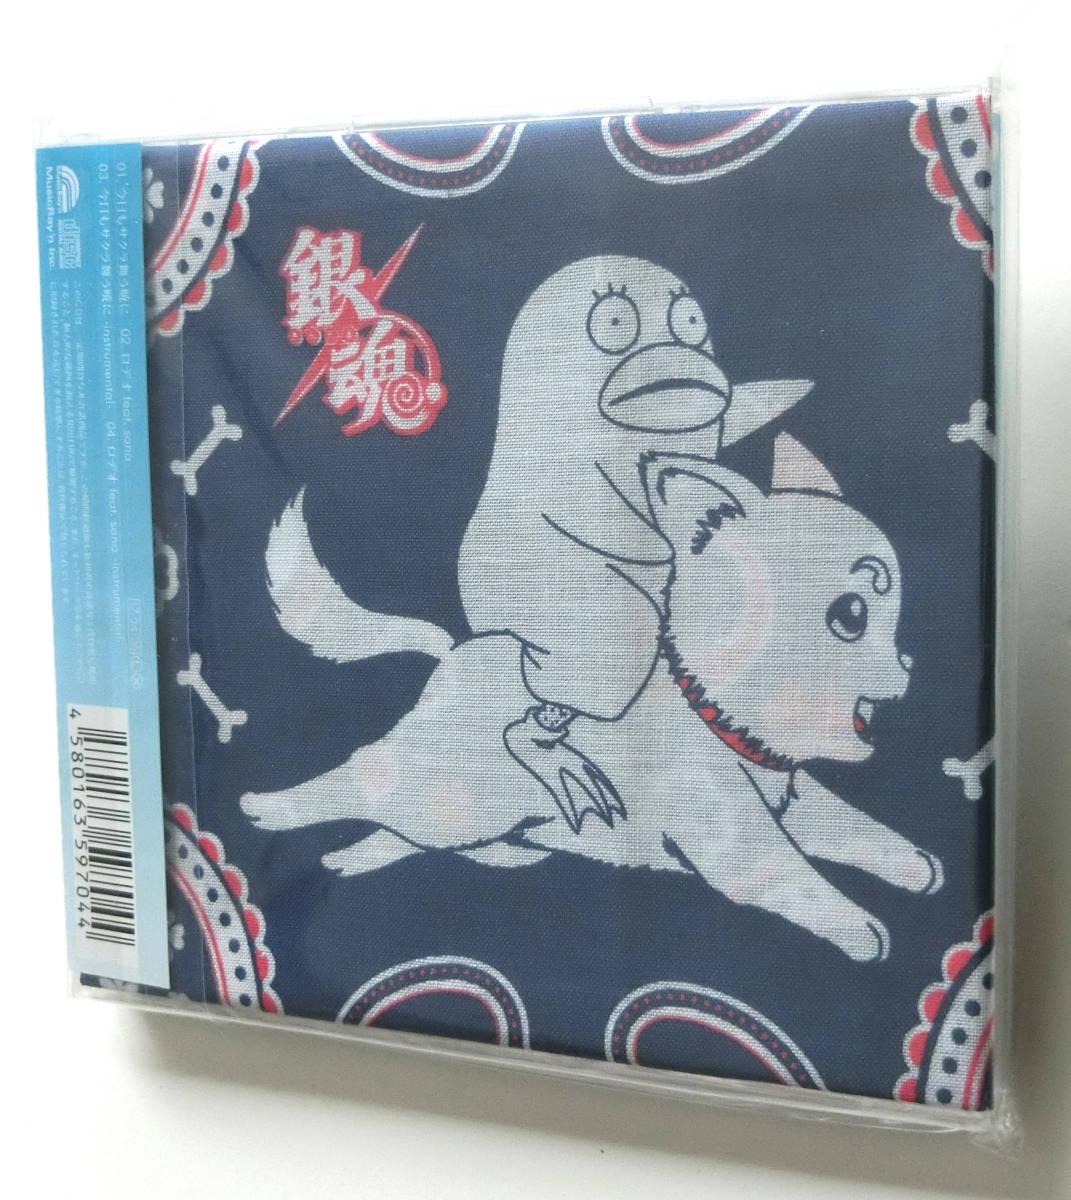 CHiCO with HoneyWorks / 今日もサクラ舞う暁に 期間限定 アニメ盤 CDシングル_画像2